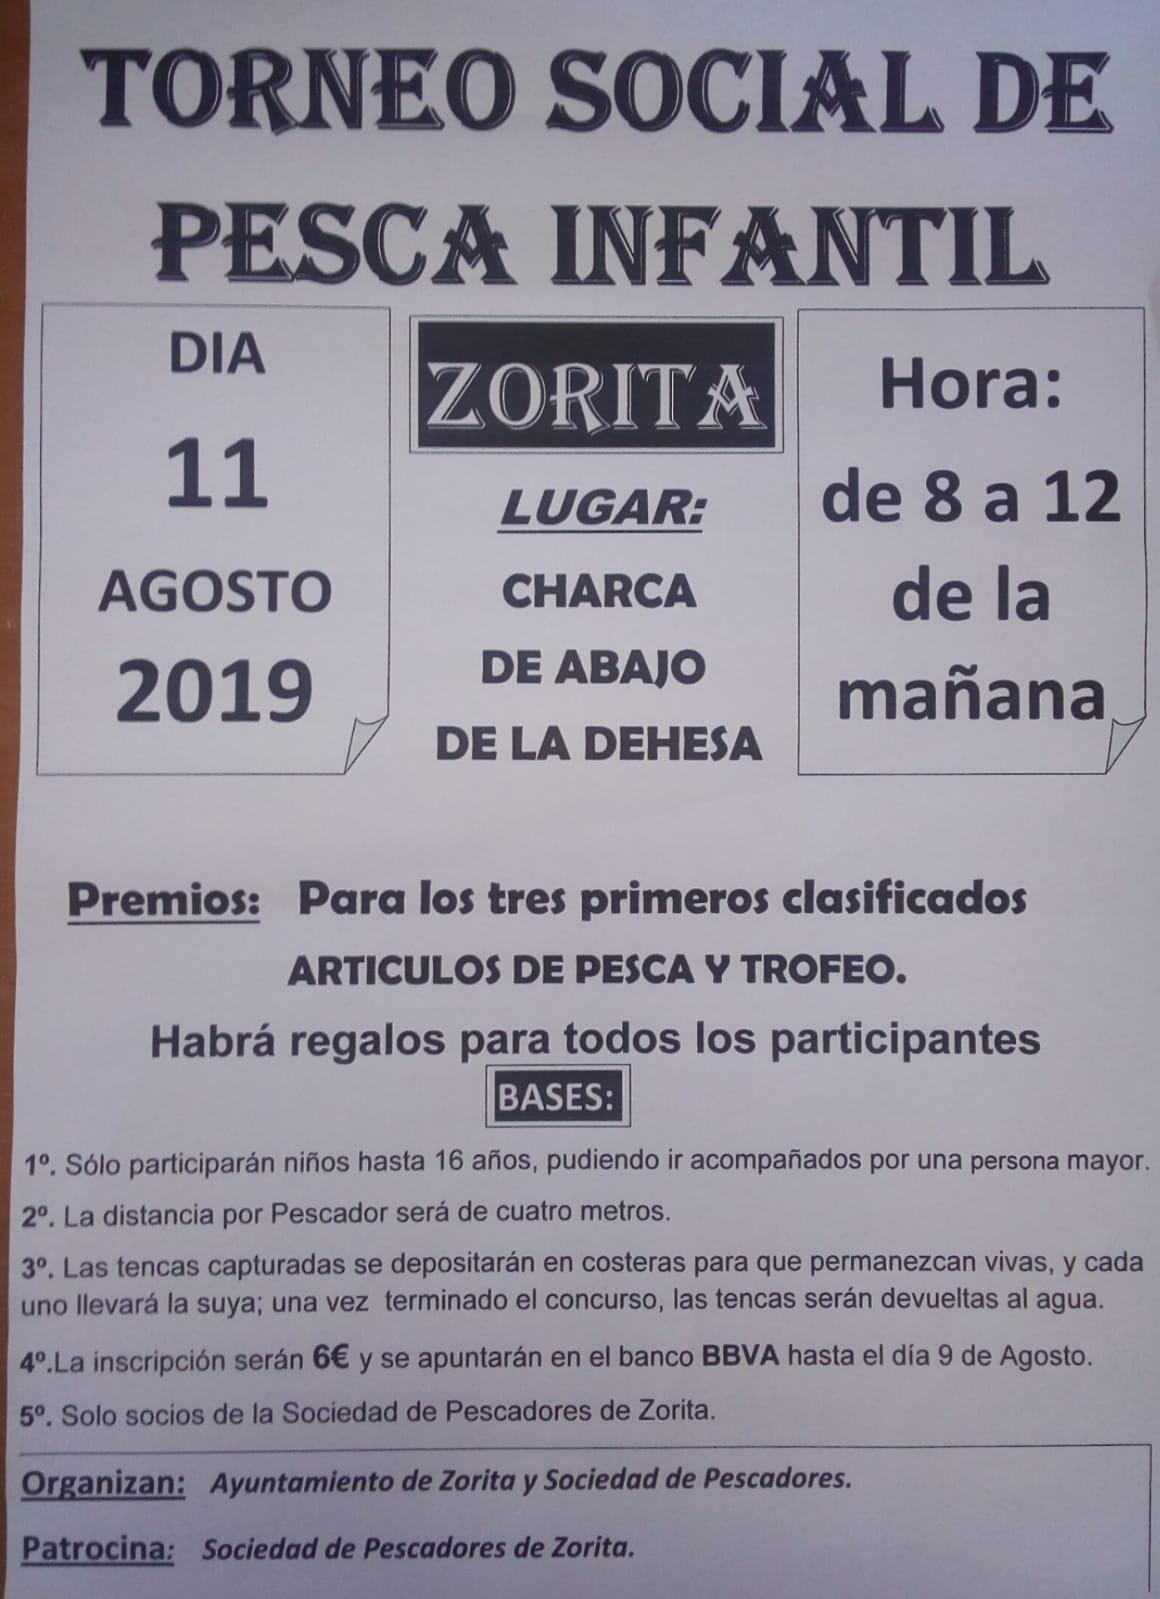 Torneo social de pesca infantil agosto 2019 - Zorita (Cáceres)